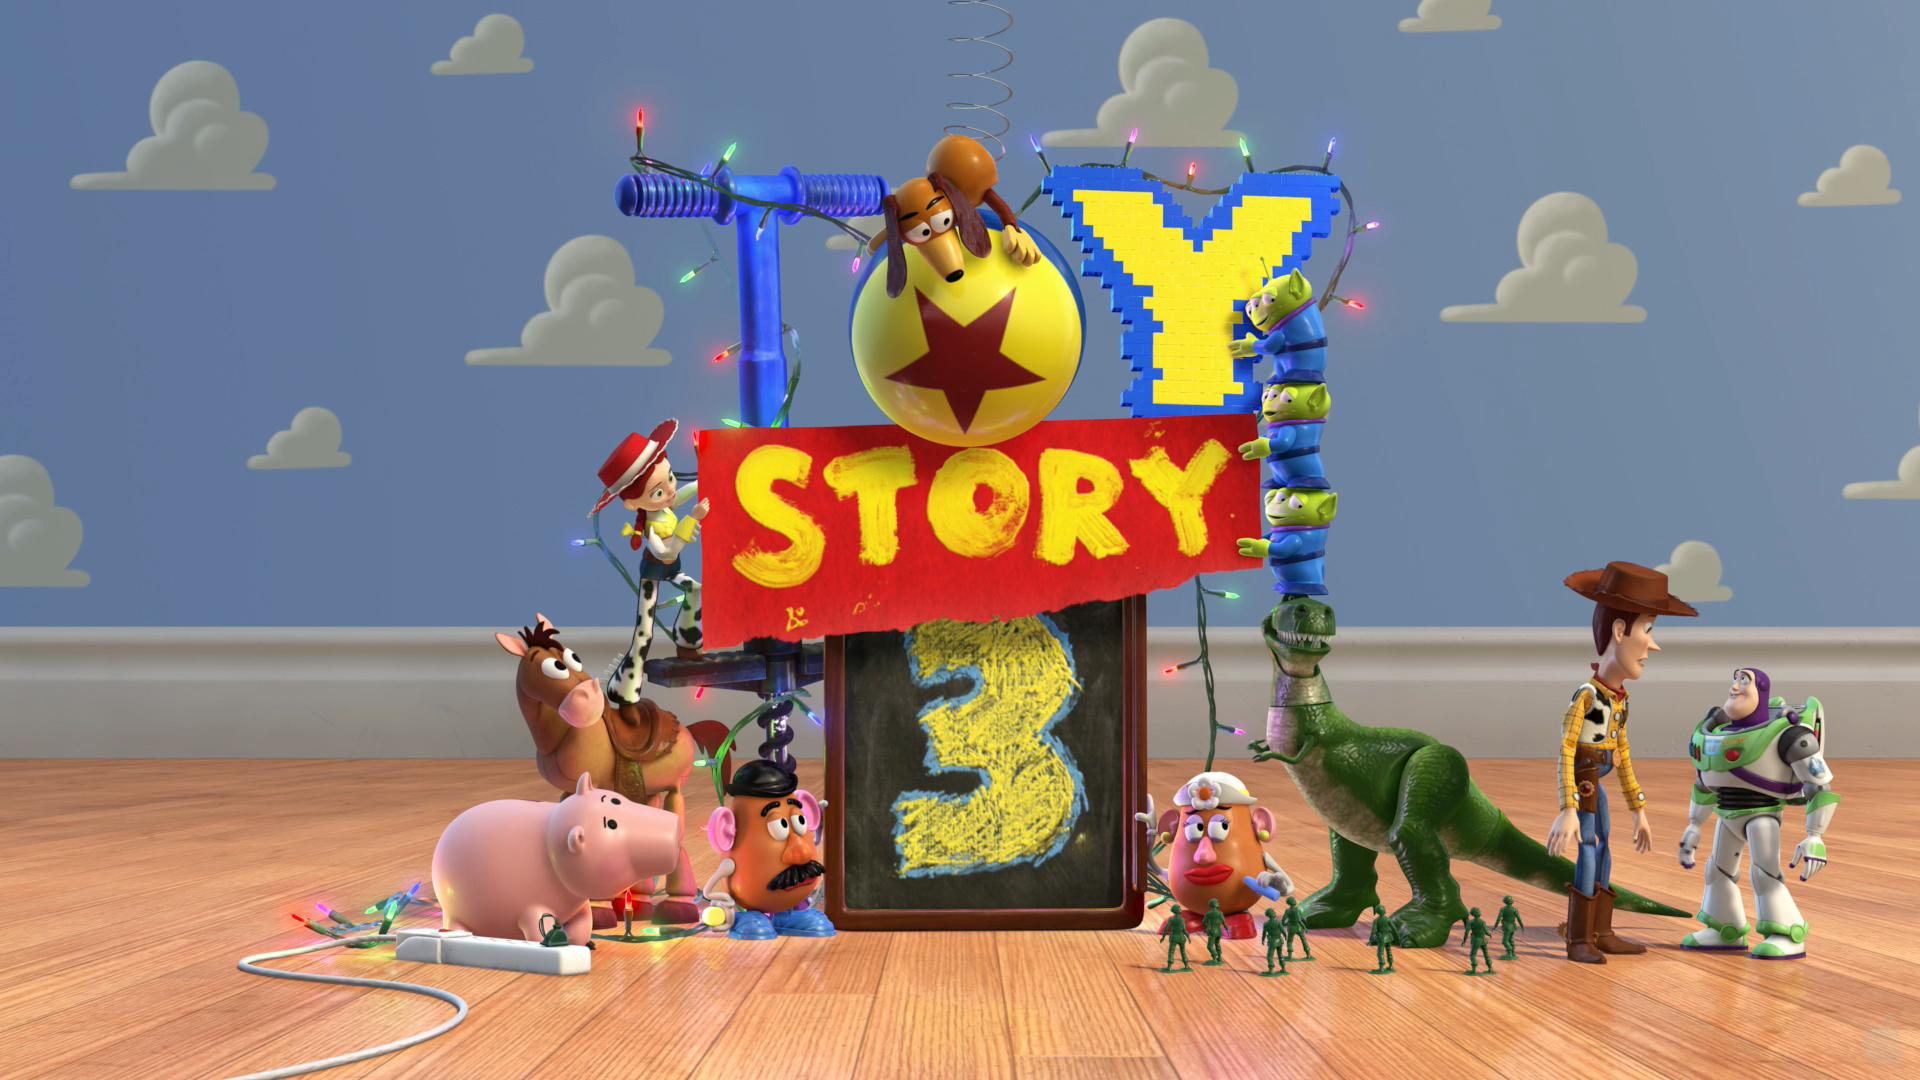 Toy Story 3 Alien Cookies 1920x1080